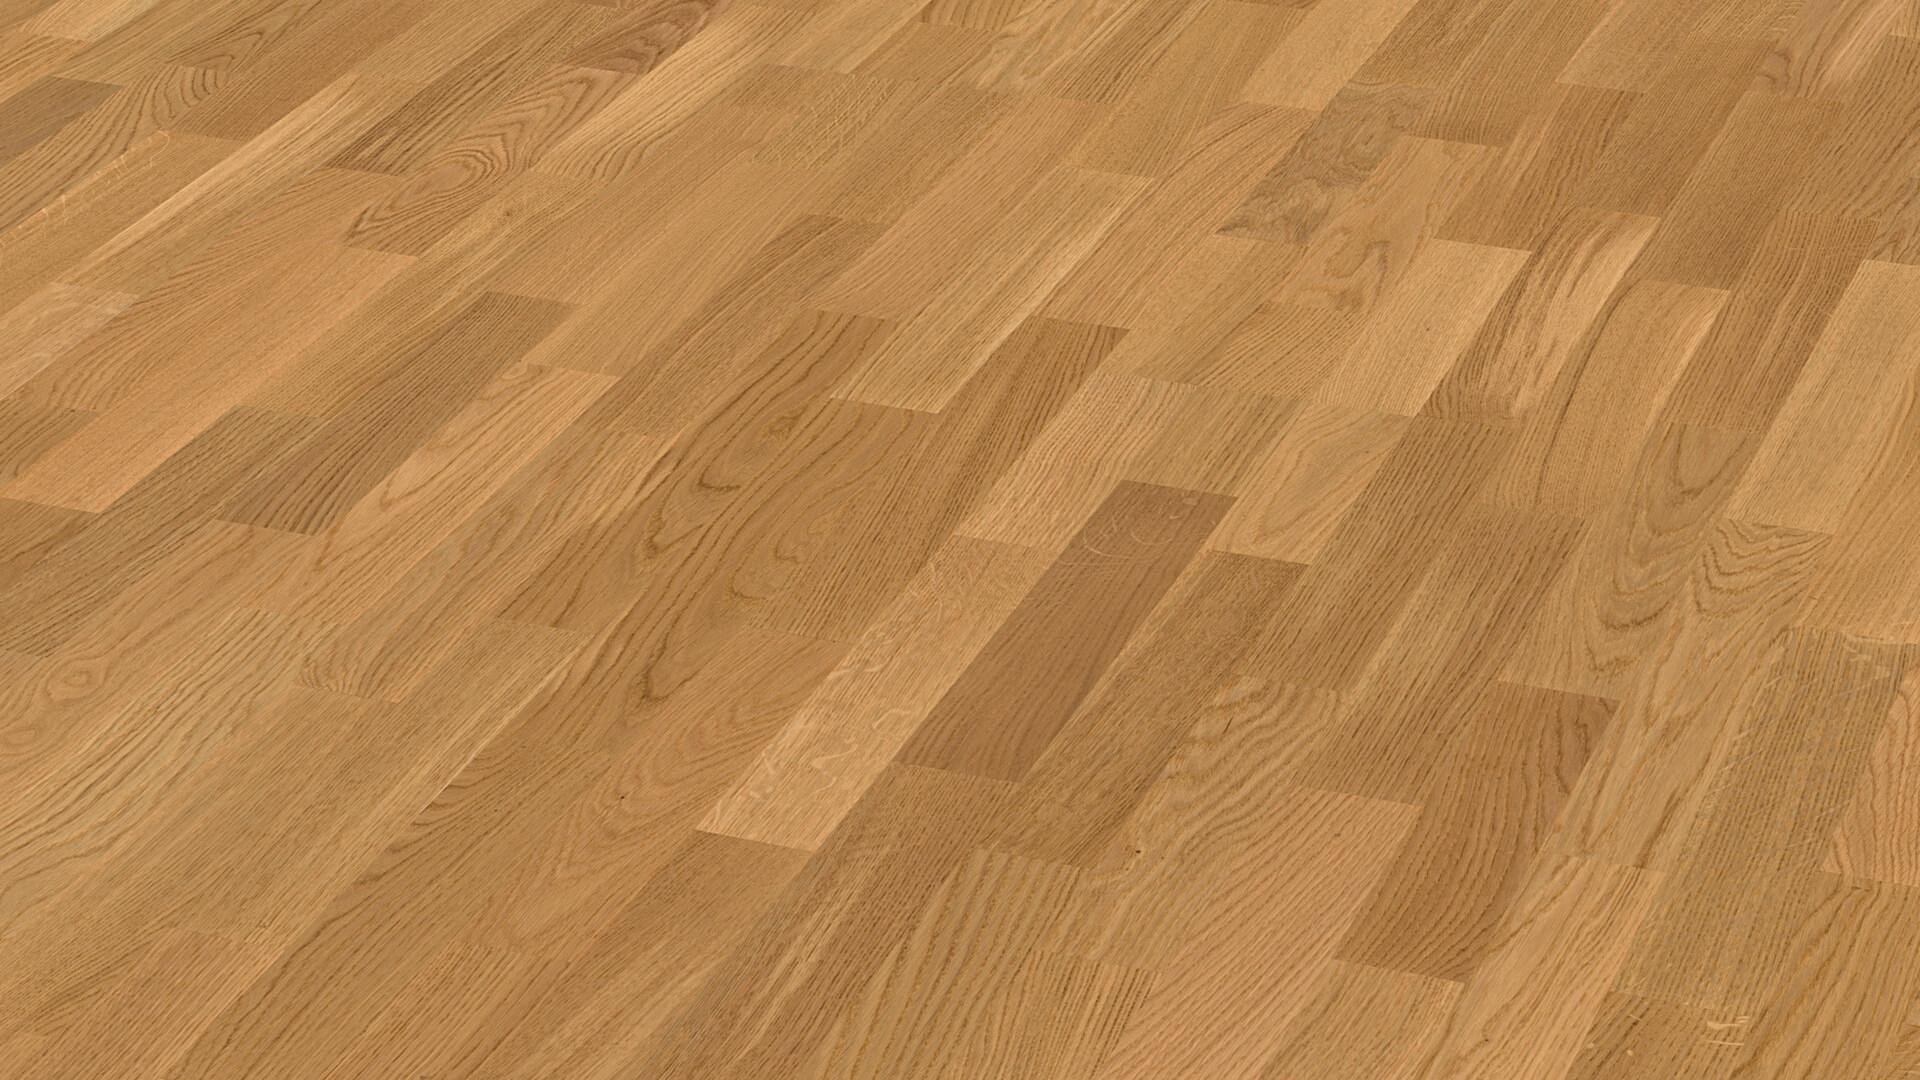 Parquet flooring MeisterParquet. longlife PC 200 Oak harmonious 910